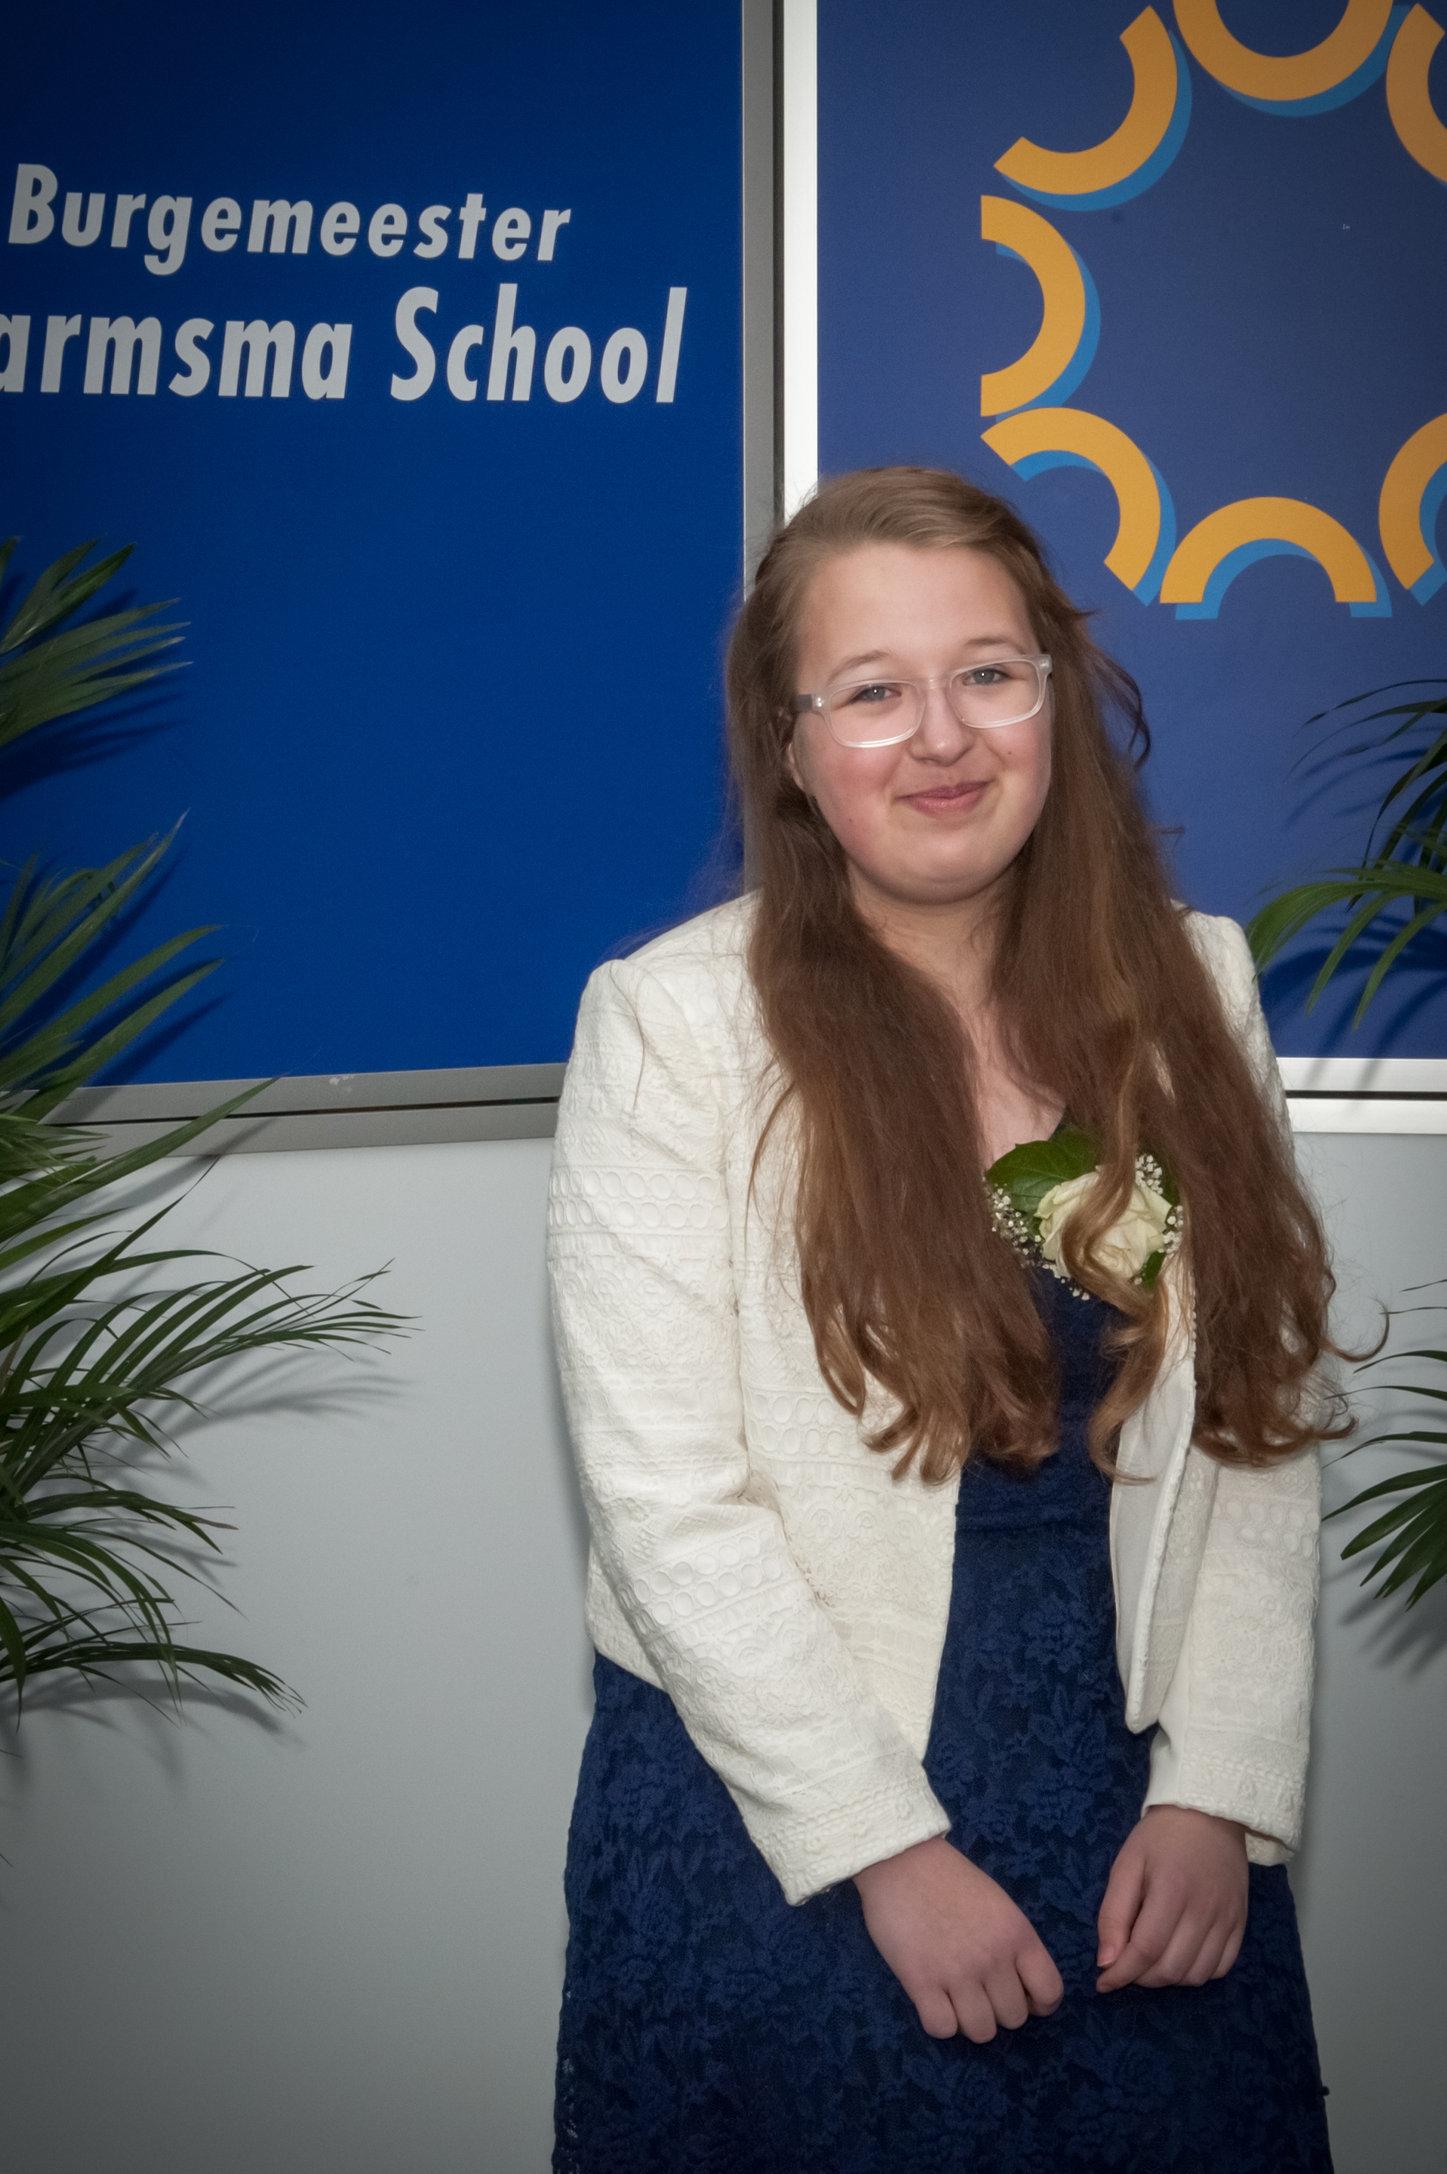 Larissa_diploma-4202-2.jpg